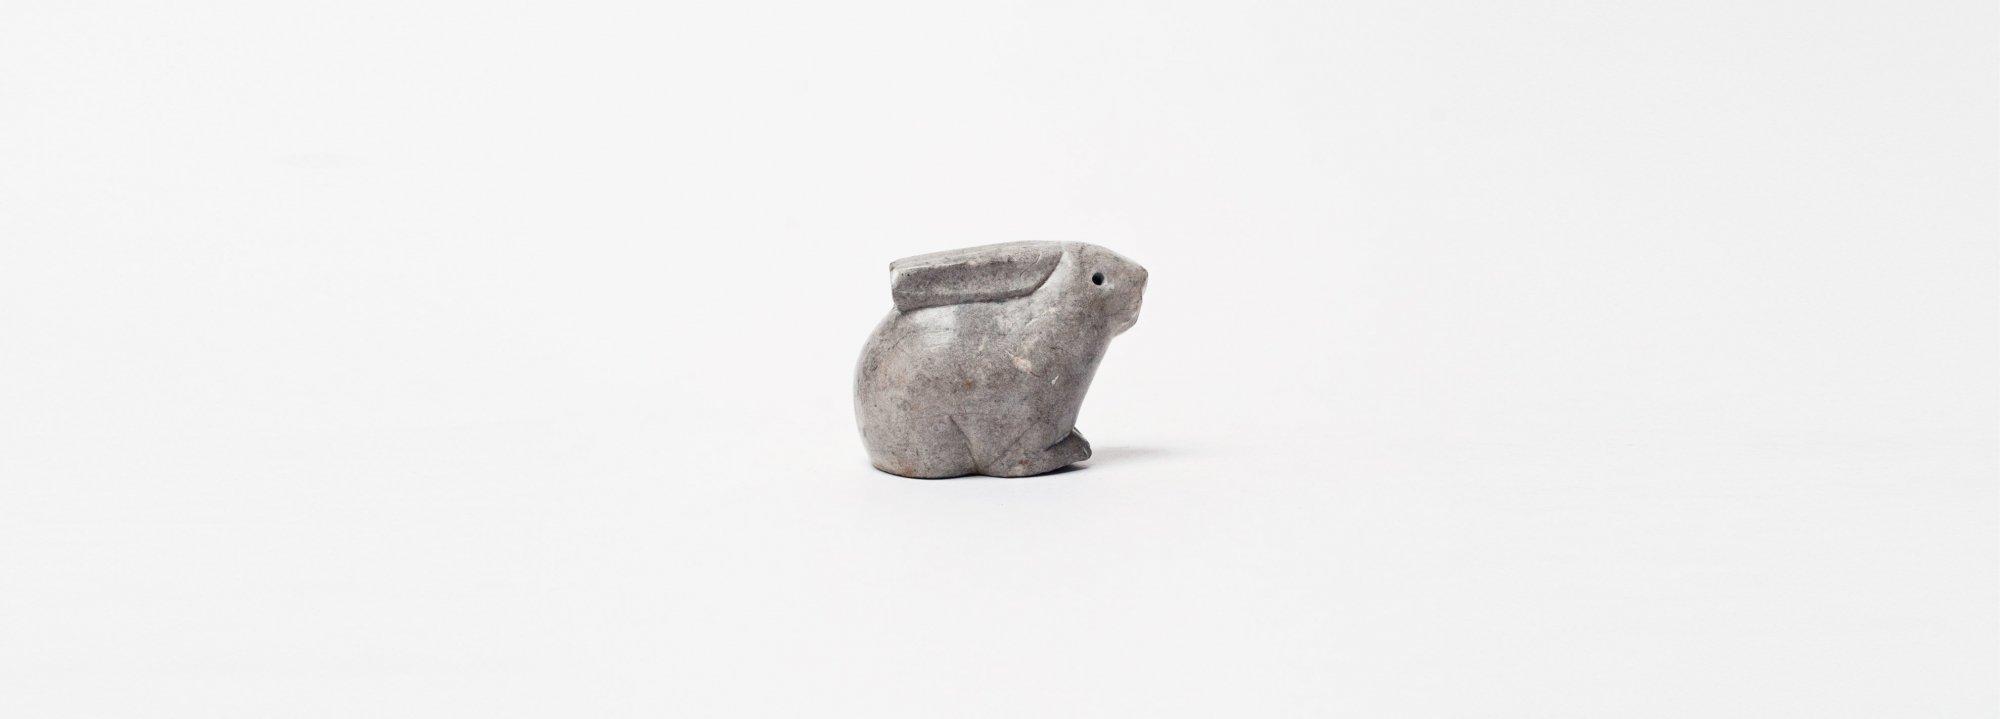 Vintage Object : Stone Rabbit